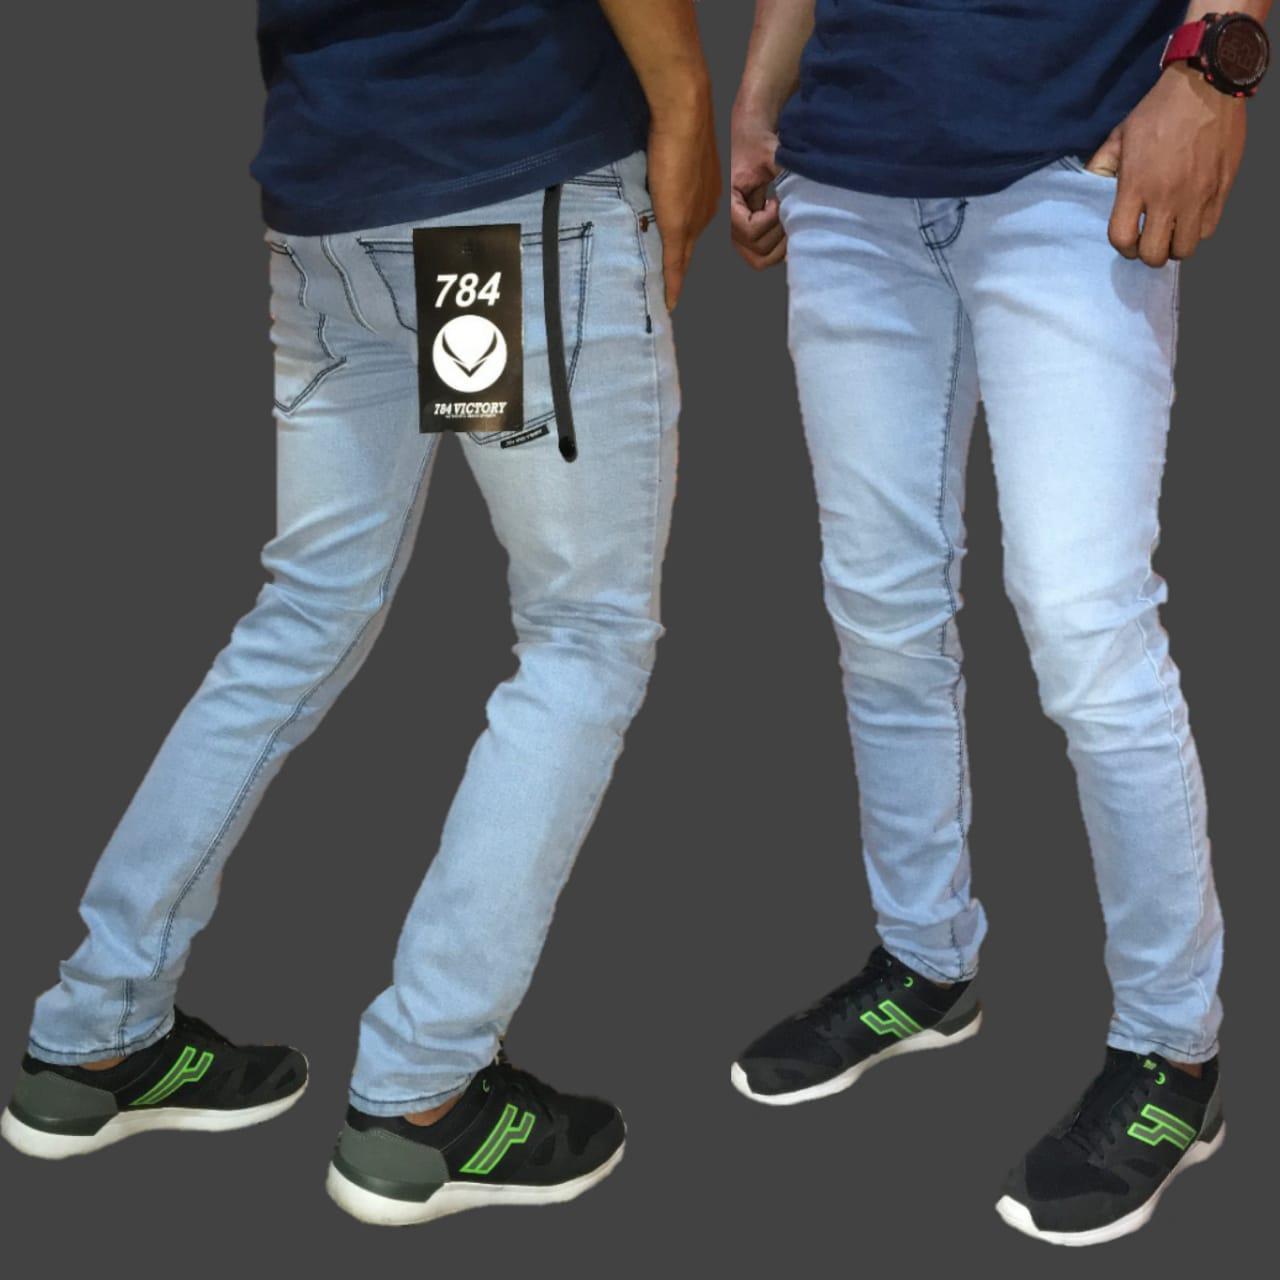 Kelebihan Celana Jeans Denim Bandung Anz Pensil Skinny Streach Levis 511t Slim Fit Ama Canyon Dark 04511 2403 Size 32 Svdn Slimfit Pria Bioblith Scrub